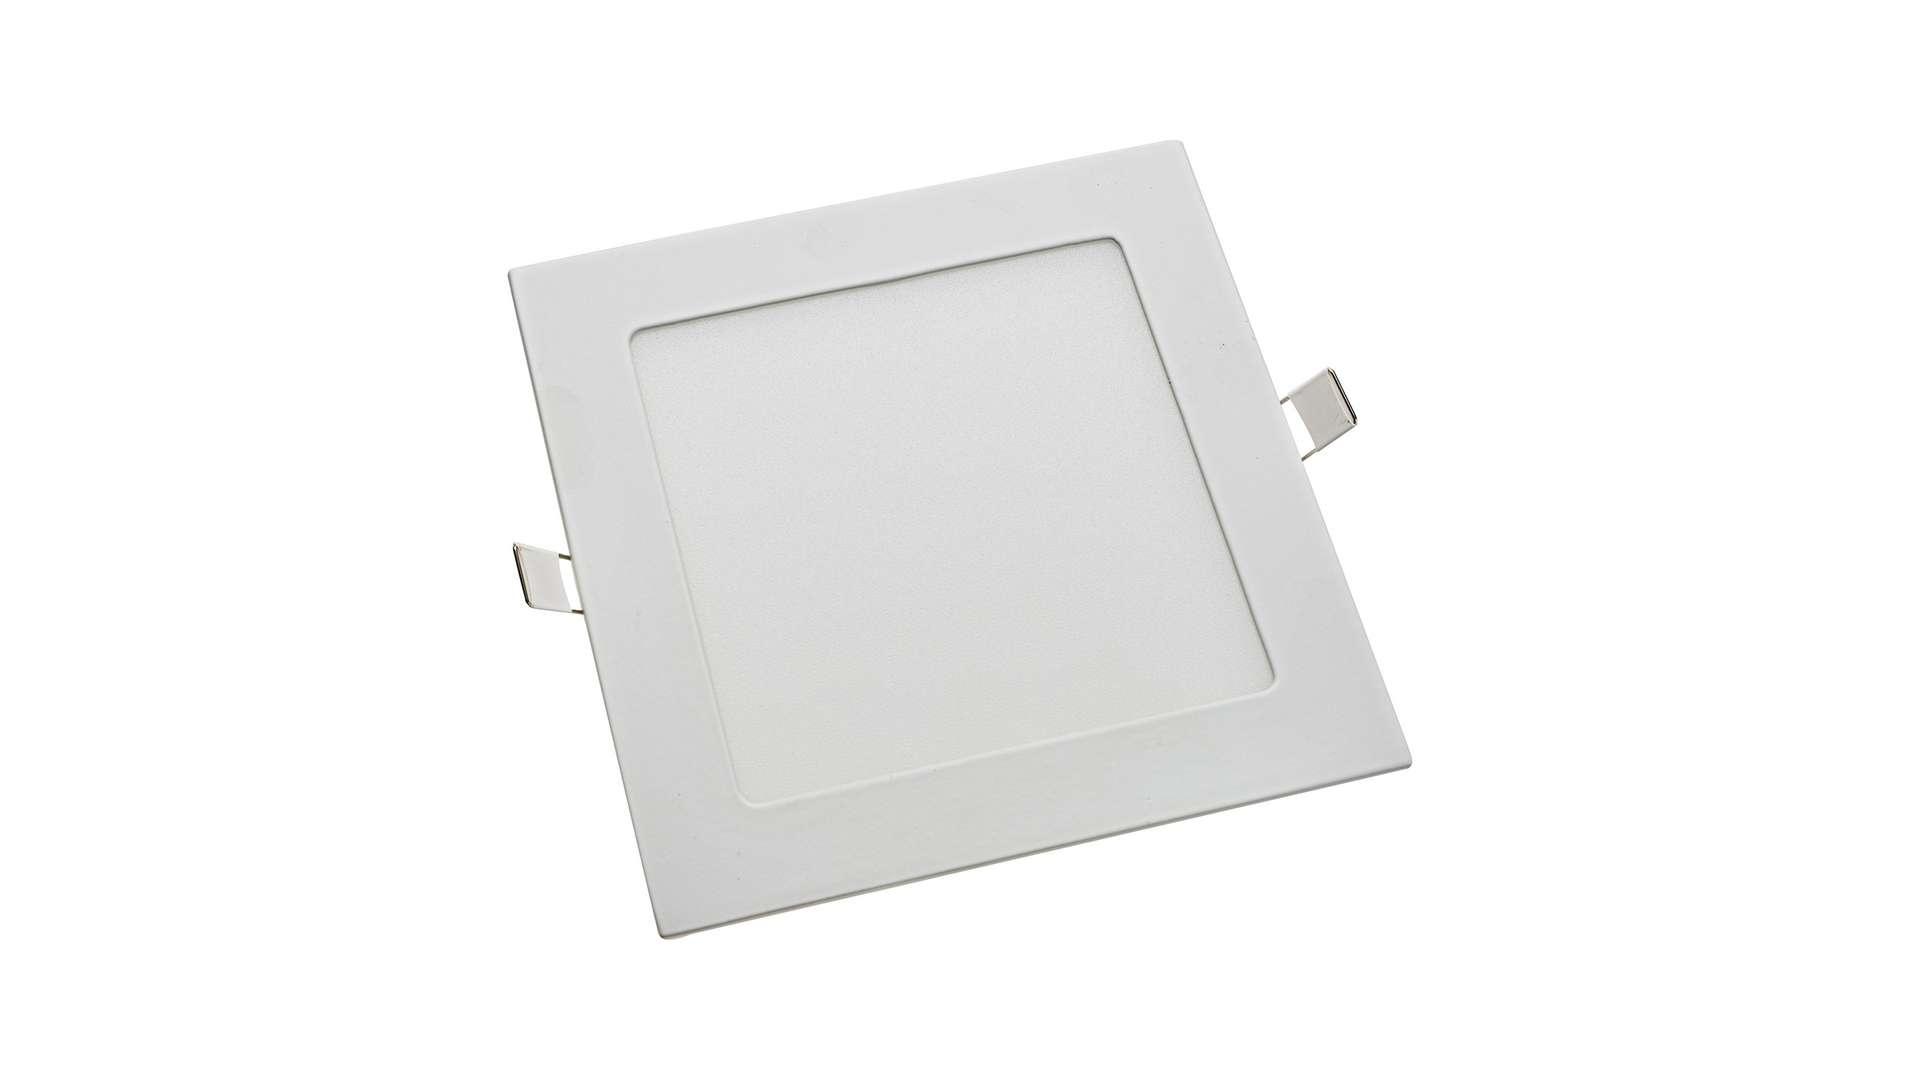 LED Panel 6W square neutral white